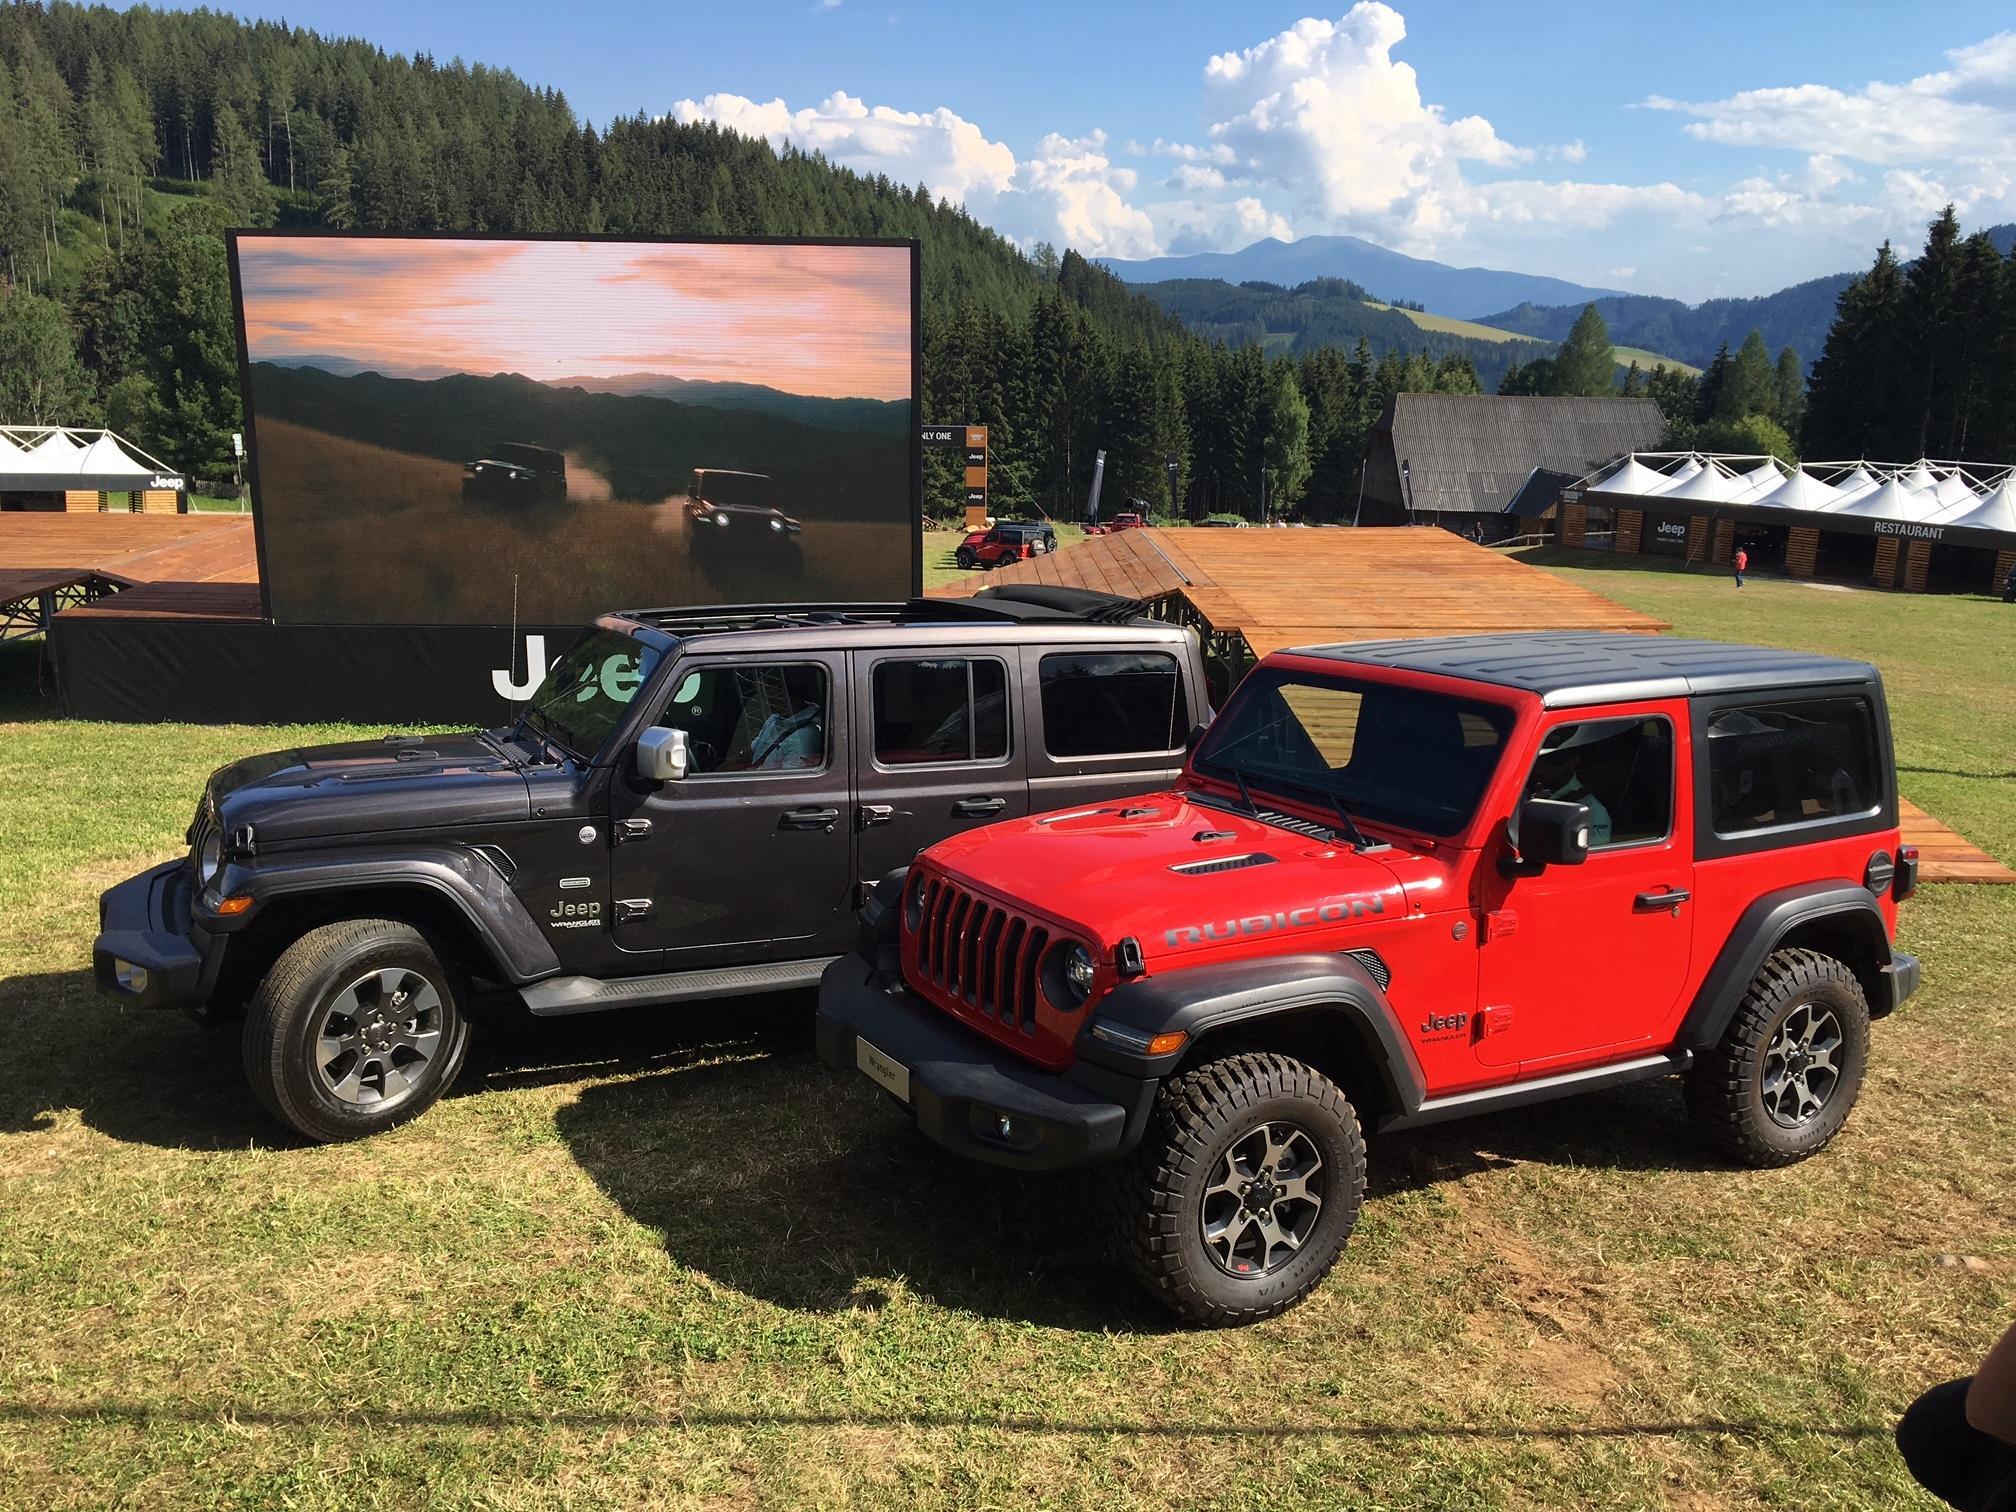 jeep wrangler 2018 les premi res images de l 39 essai en live. Black Bedroom Furniture Sets. Home Design Ideas